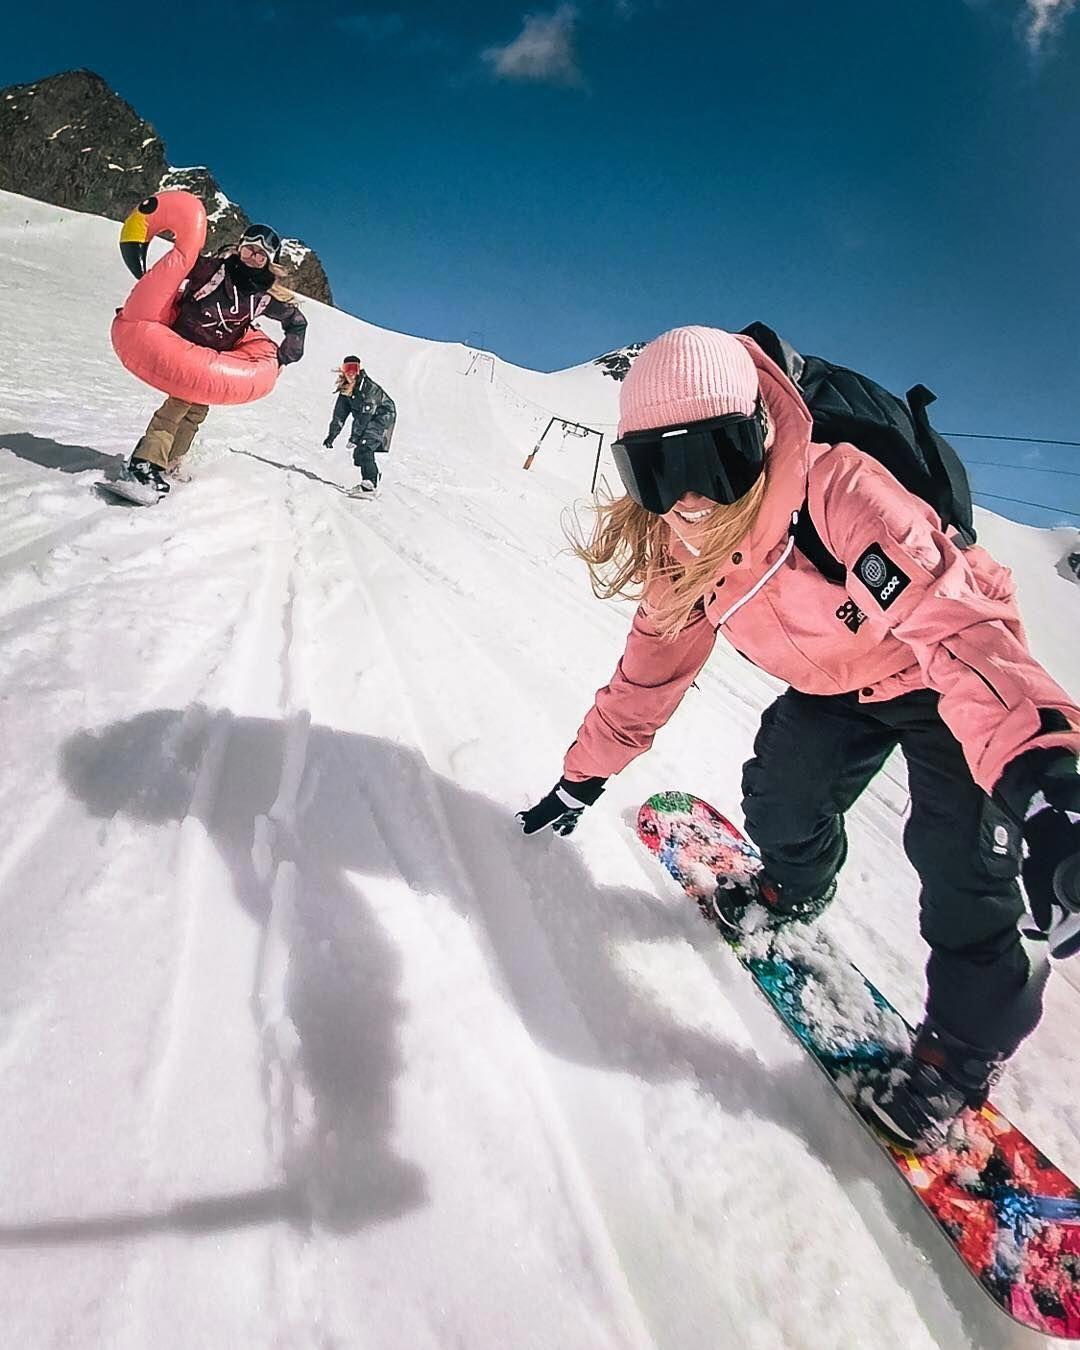 Snowboard Girl Snowboarding Women Snowboarding Outfit Snowboard Gear Womens Snow Snowboard Girl Snowboarding Women Snowboarding Outfit